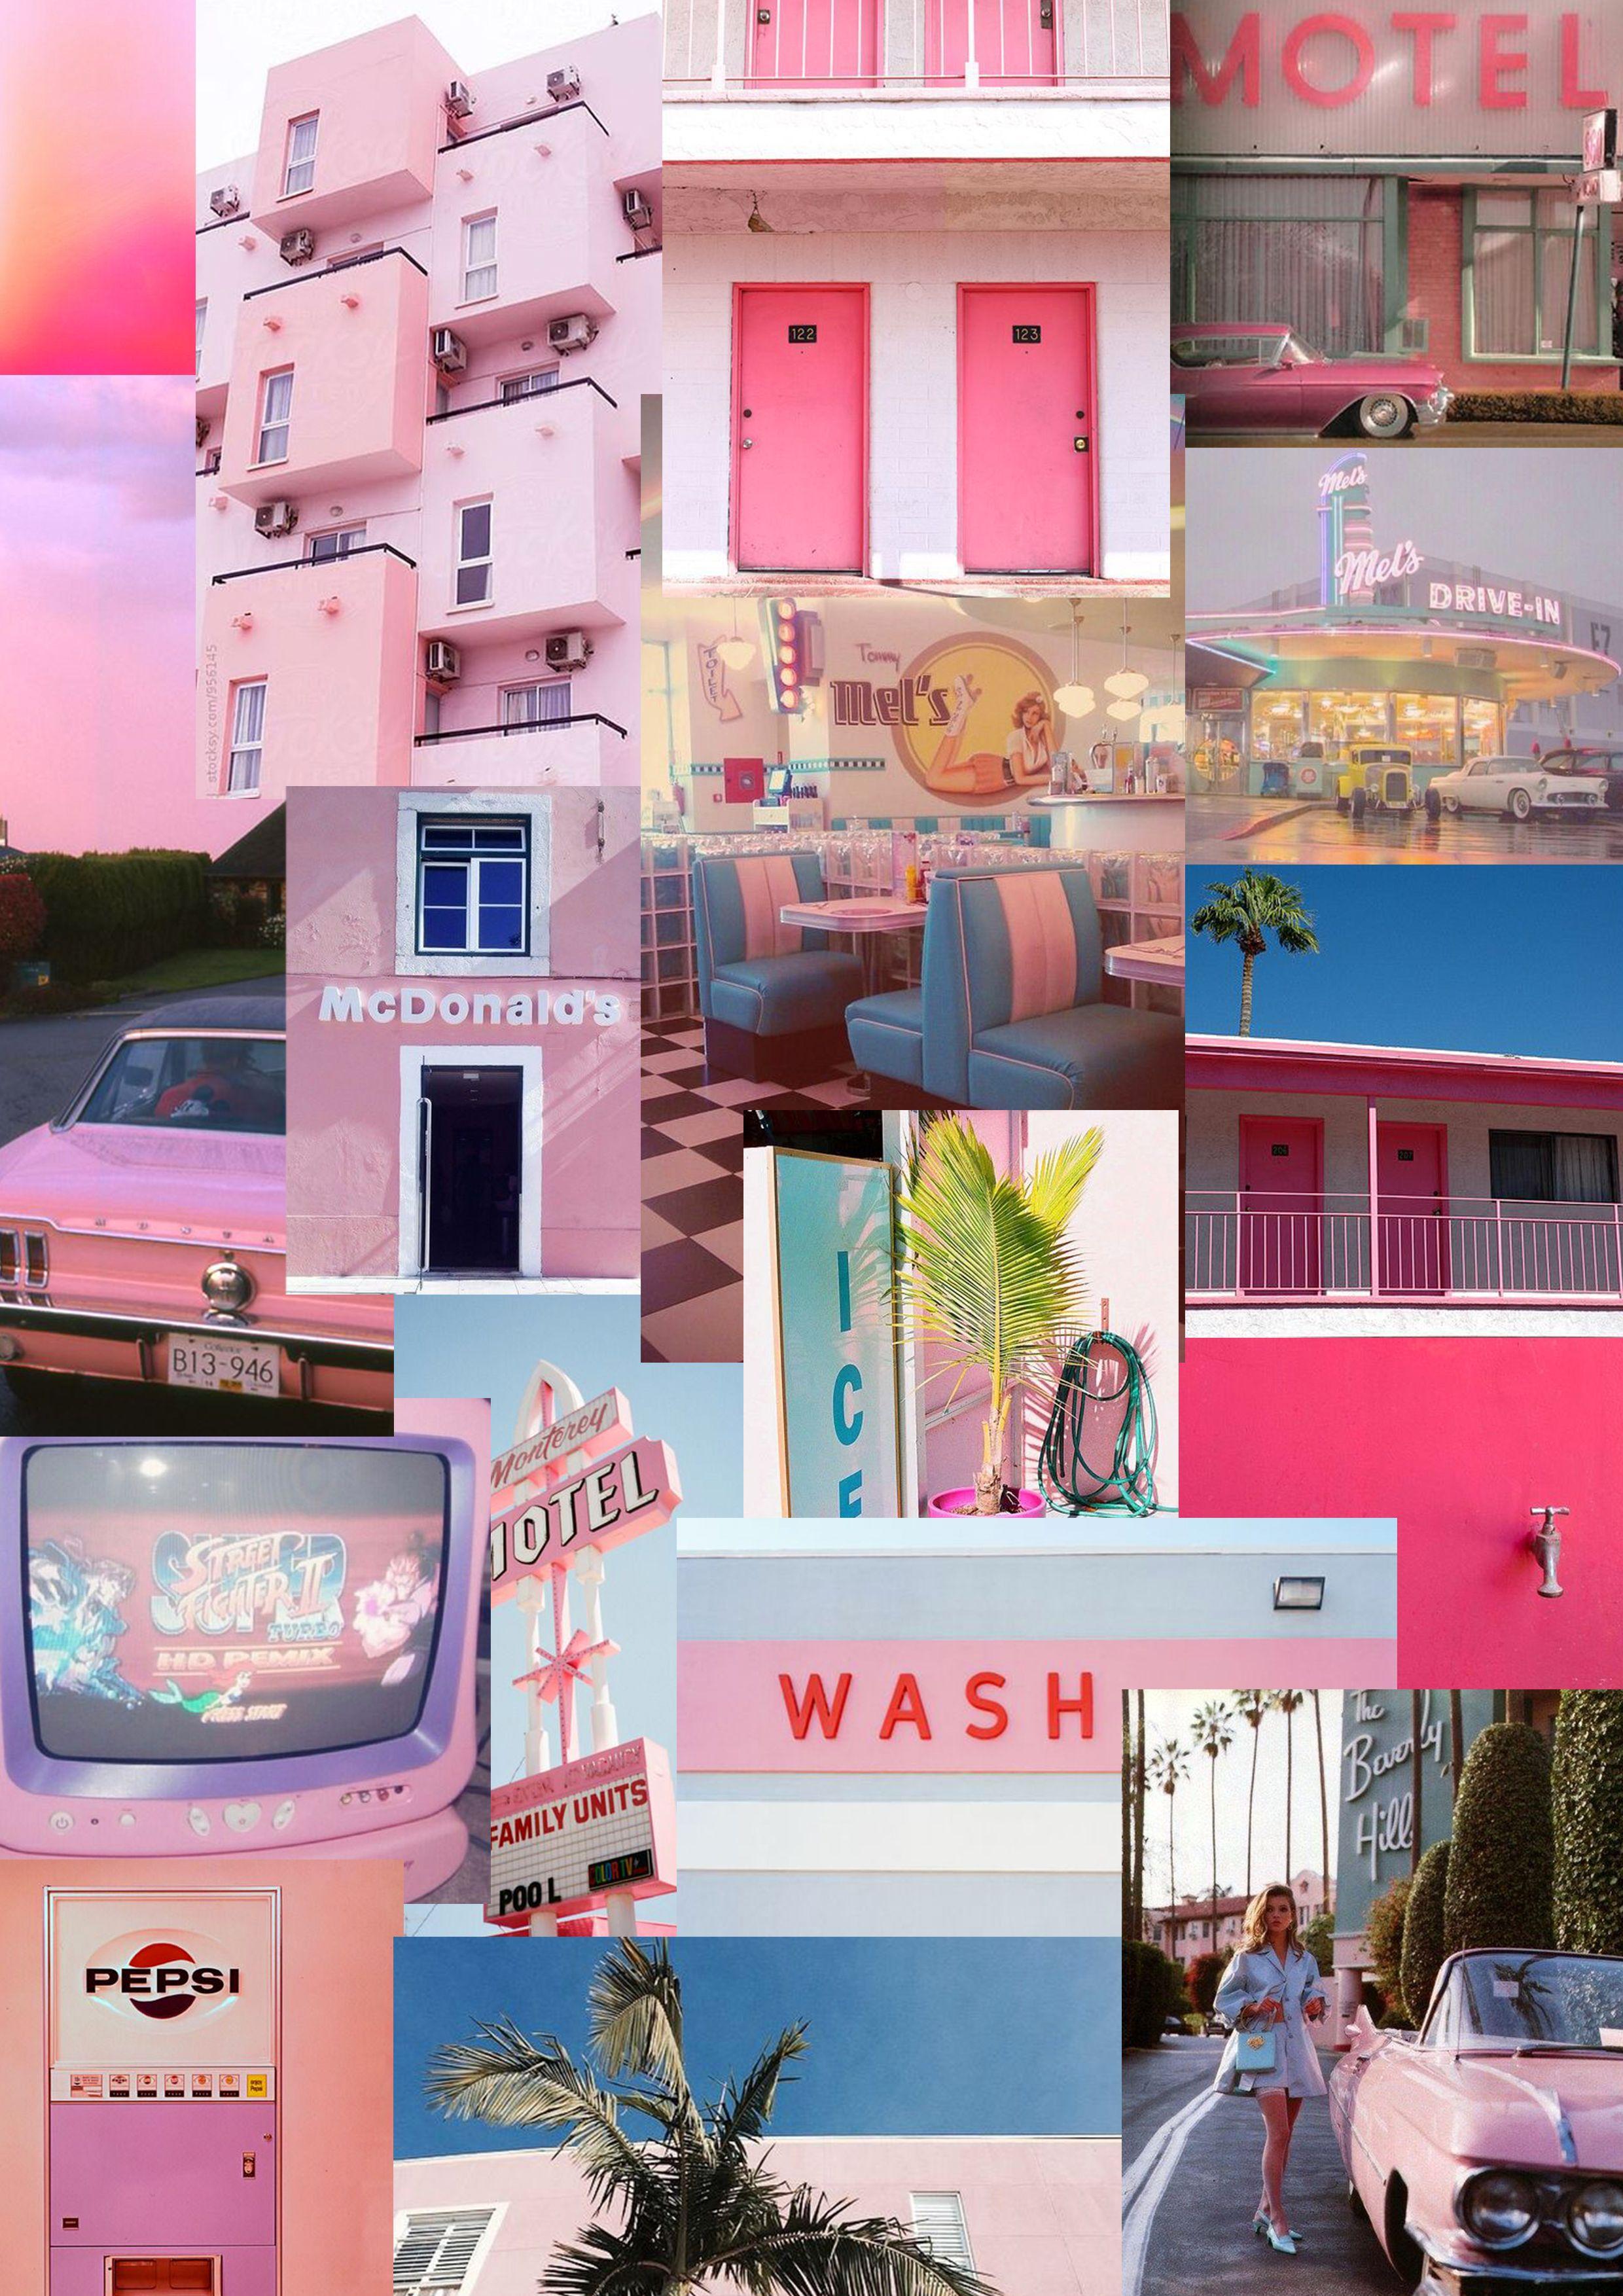 Moodboard USA+Retro+Pink